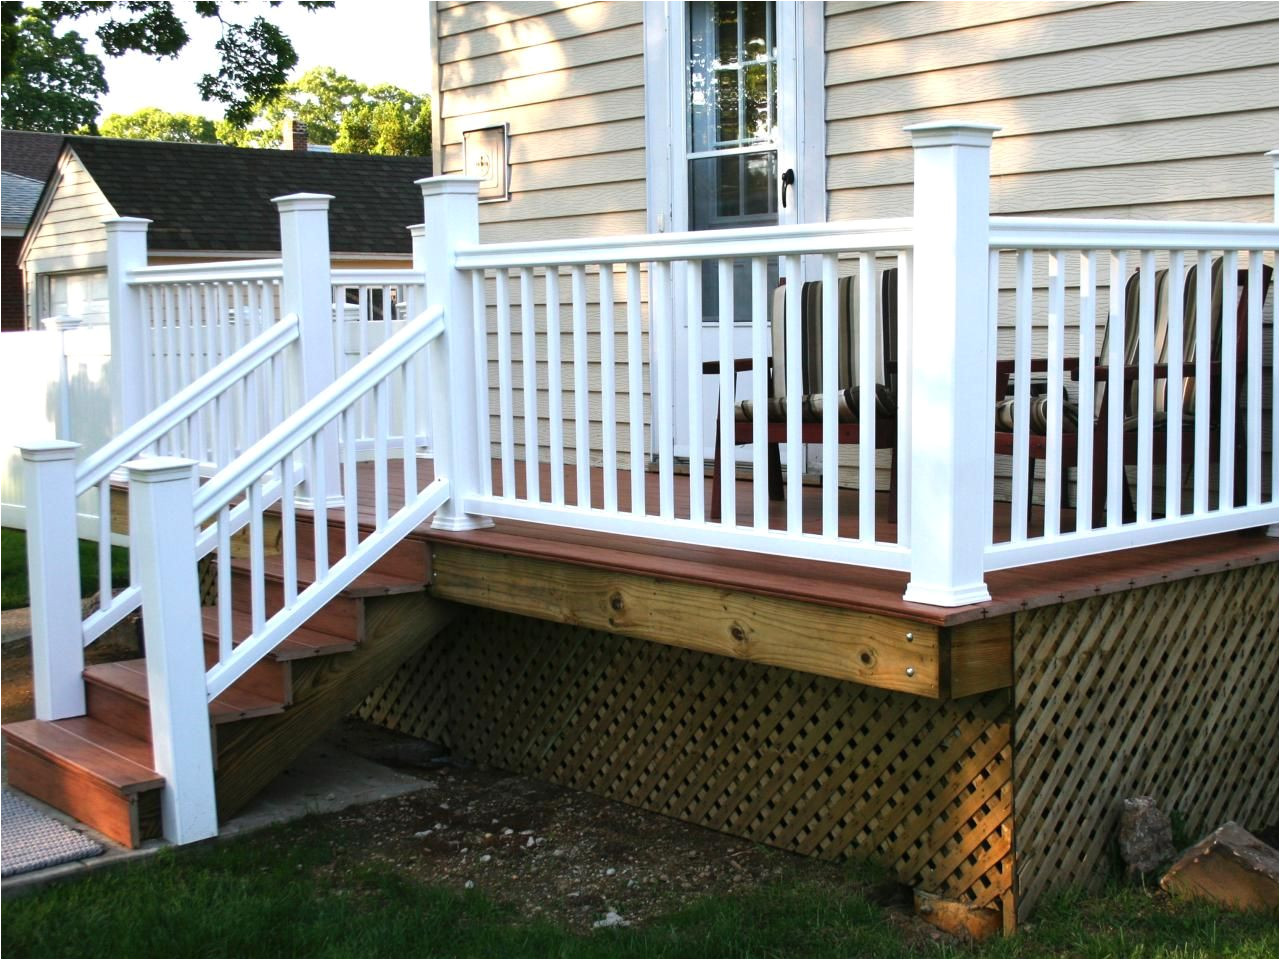 how to build a simple deck outdoor spaces patio ideas decks gardens hgtv